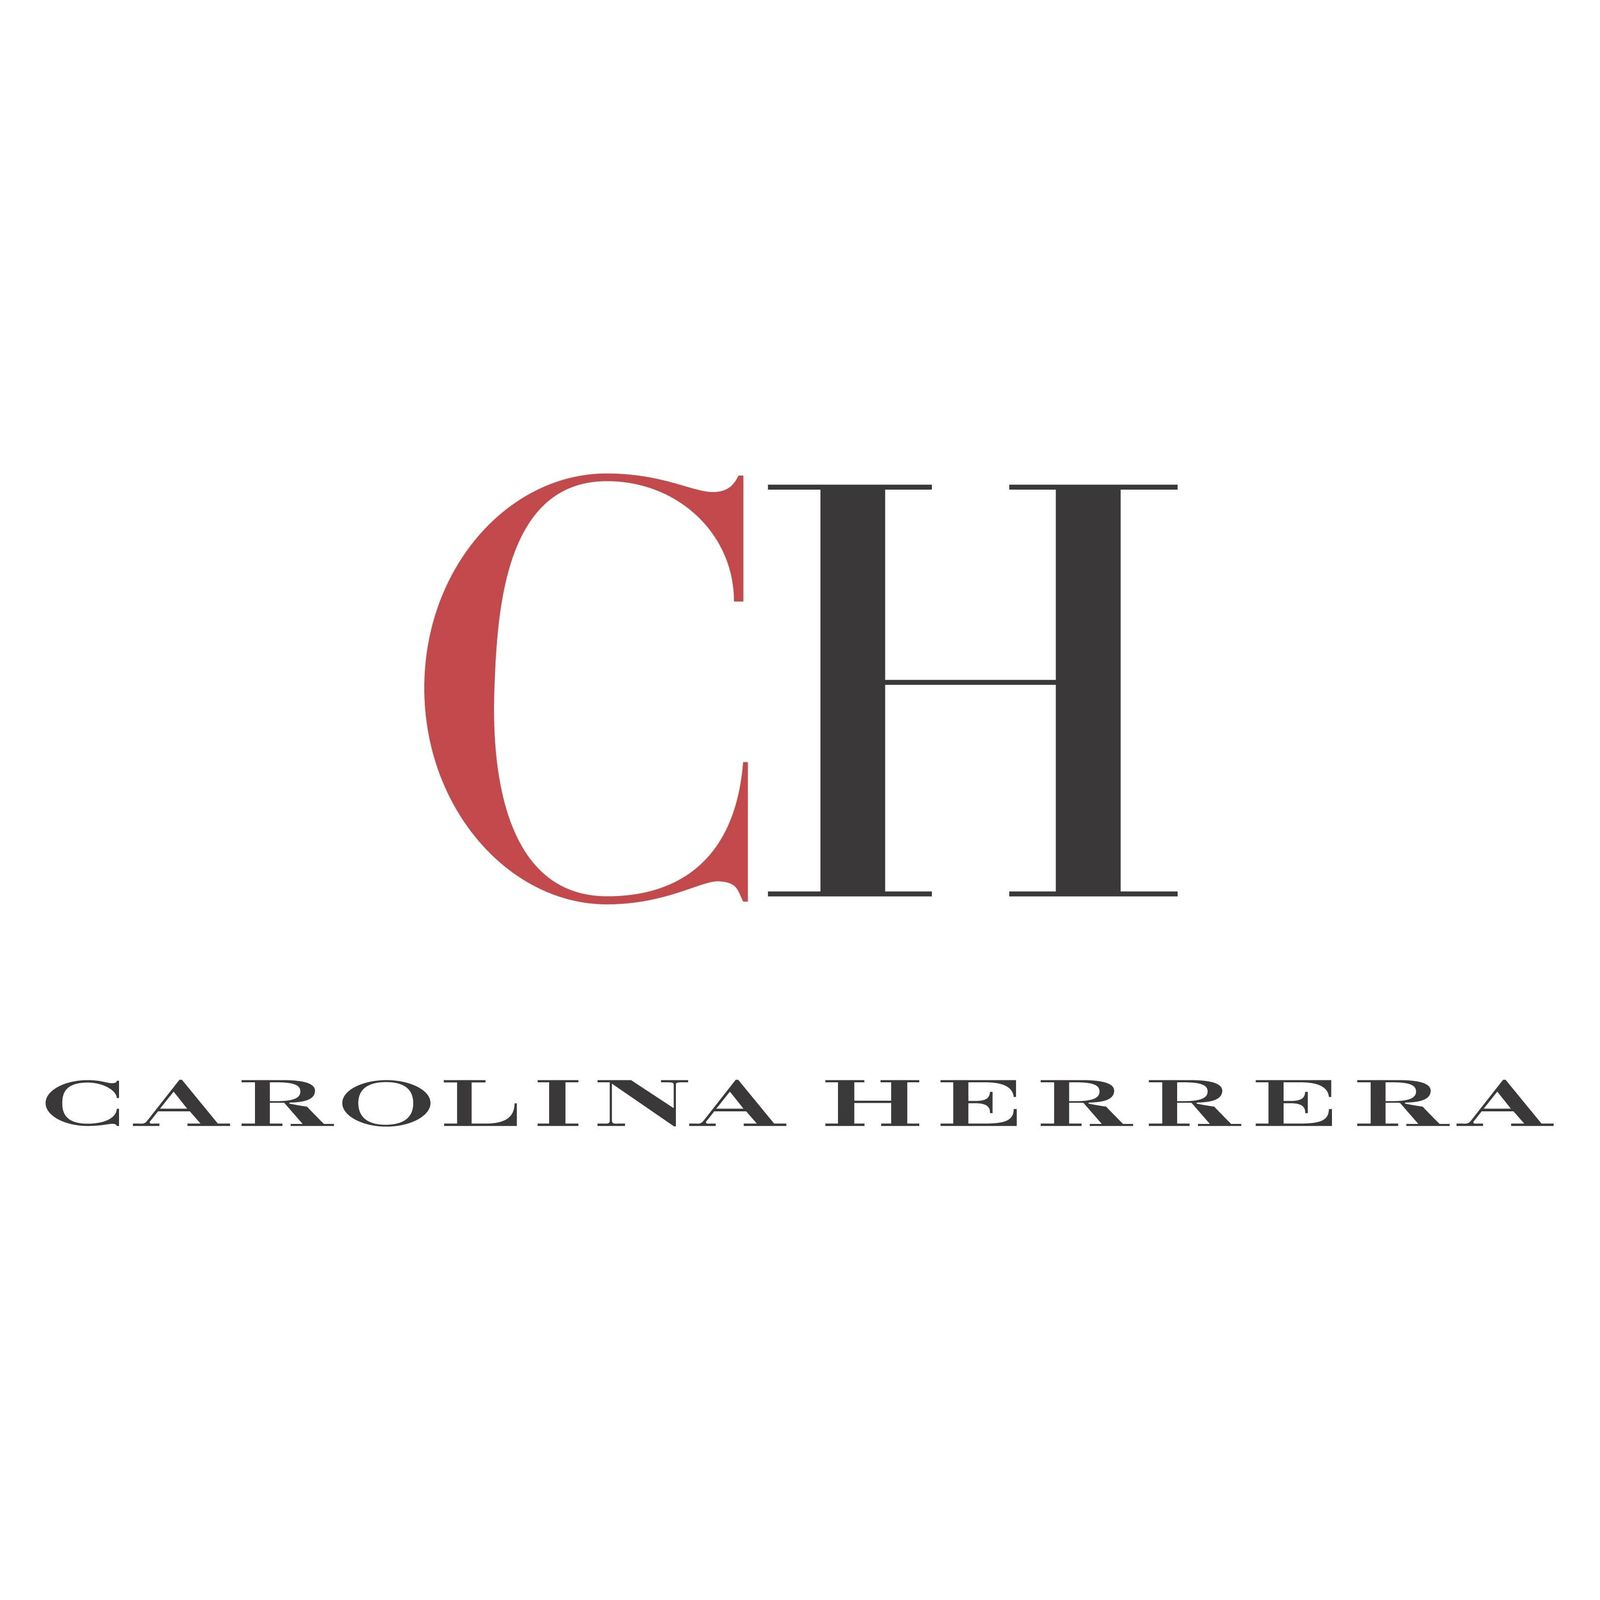 CH CAROLINA HERRERA (Image 1)